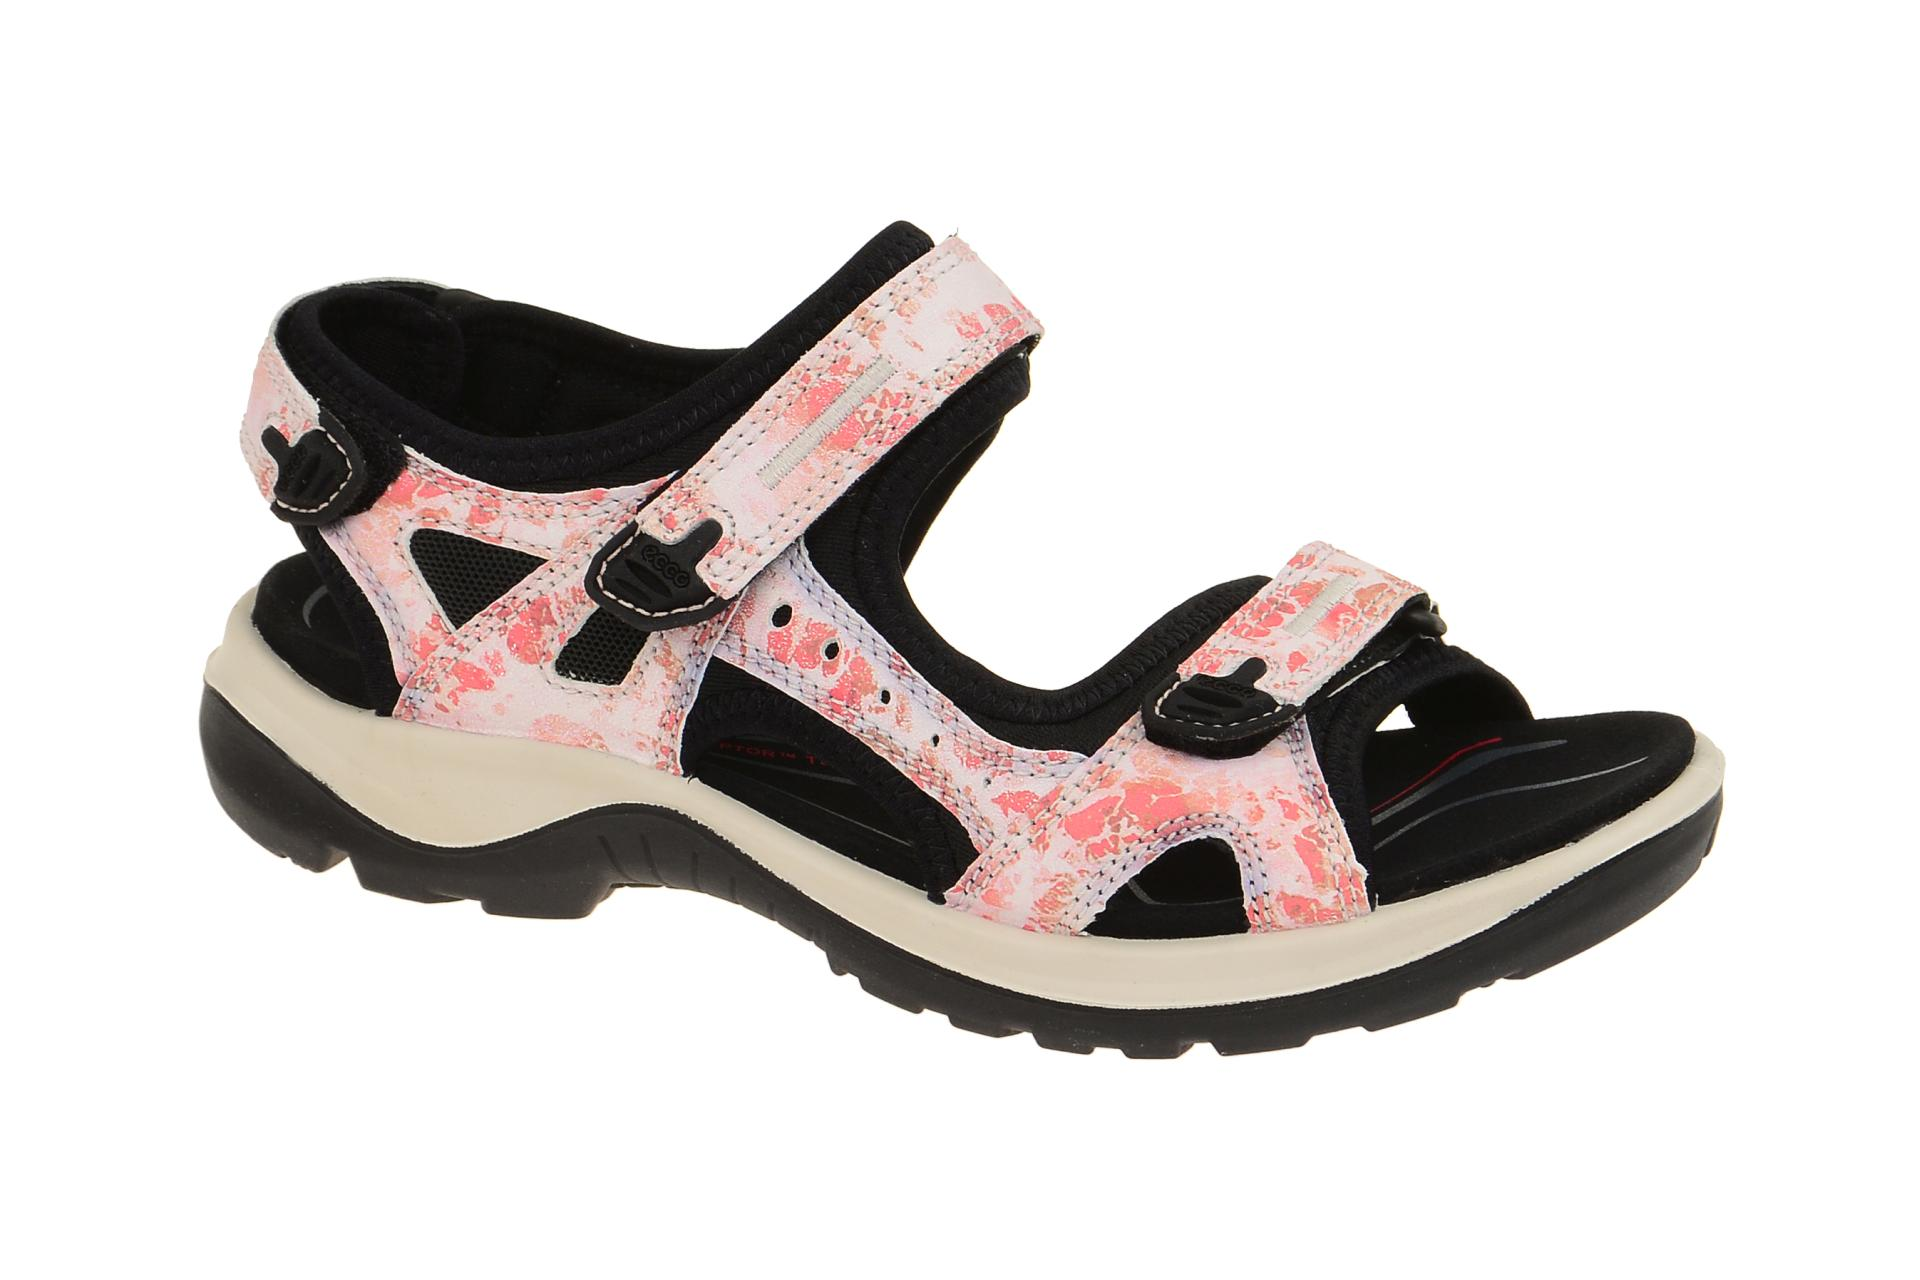 ecco damen sandale outdoor sandaletten offroad pink coral blush camo neu ebay. Black Bedroom Furniture Sets. Home Design Ideas